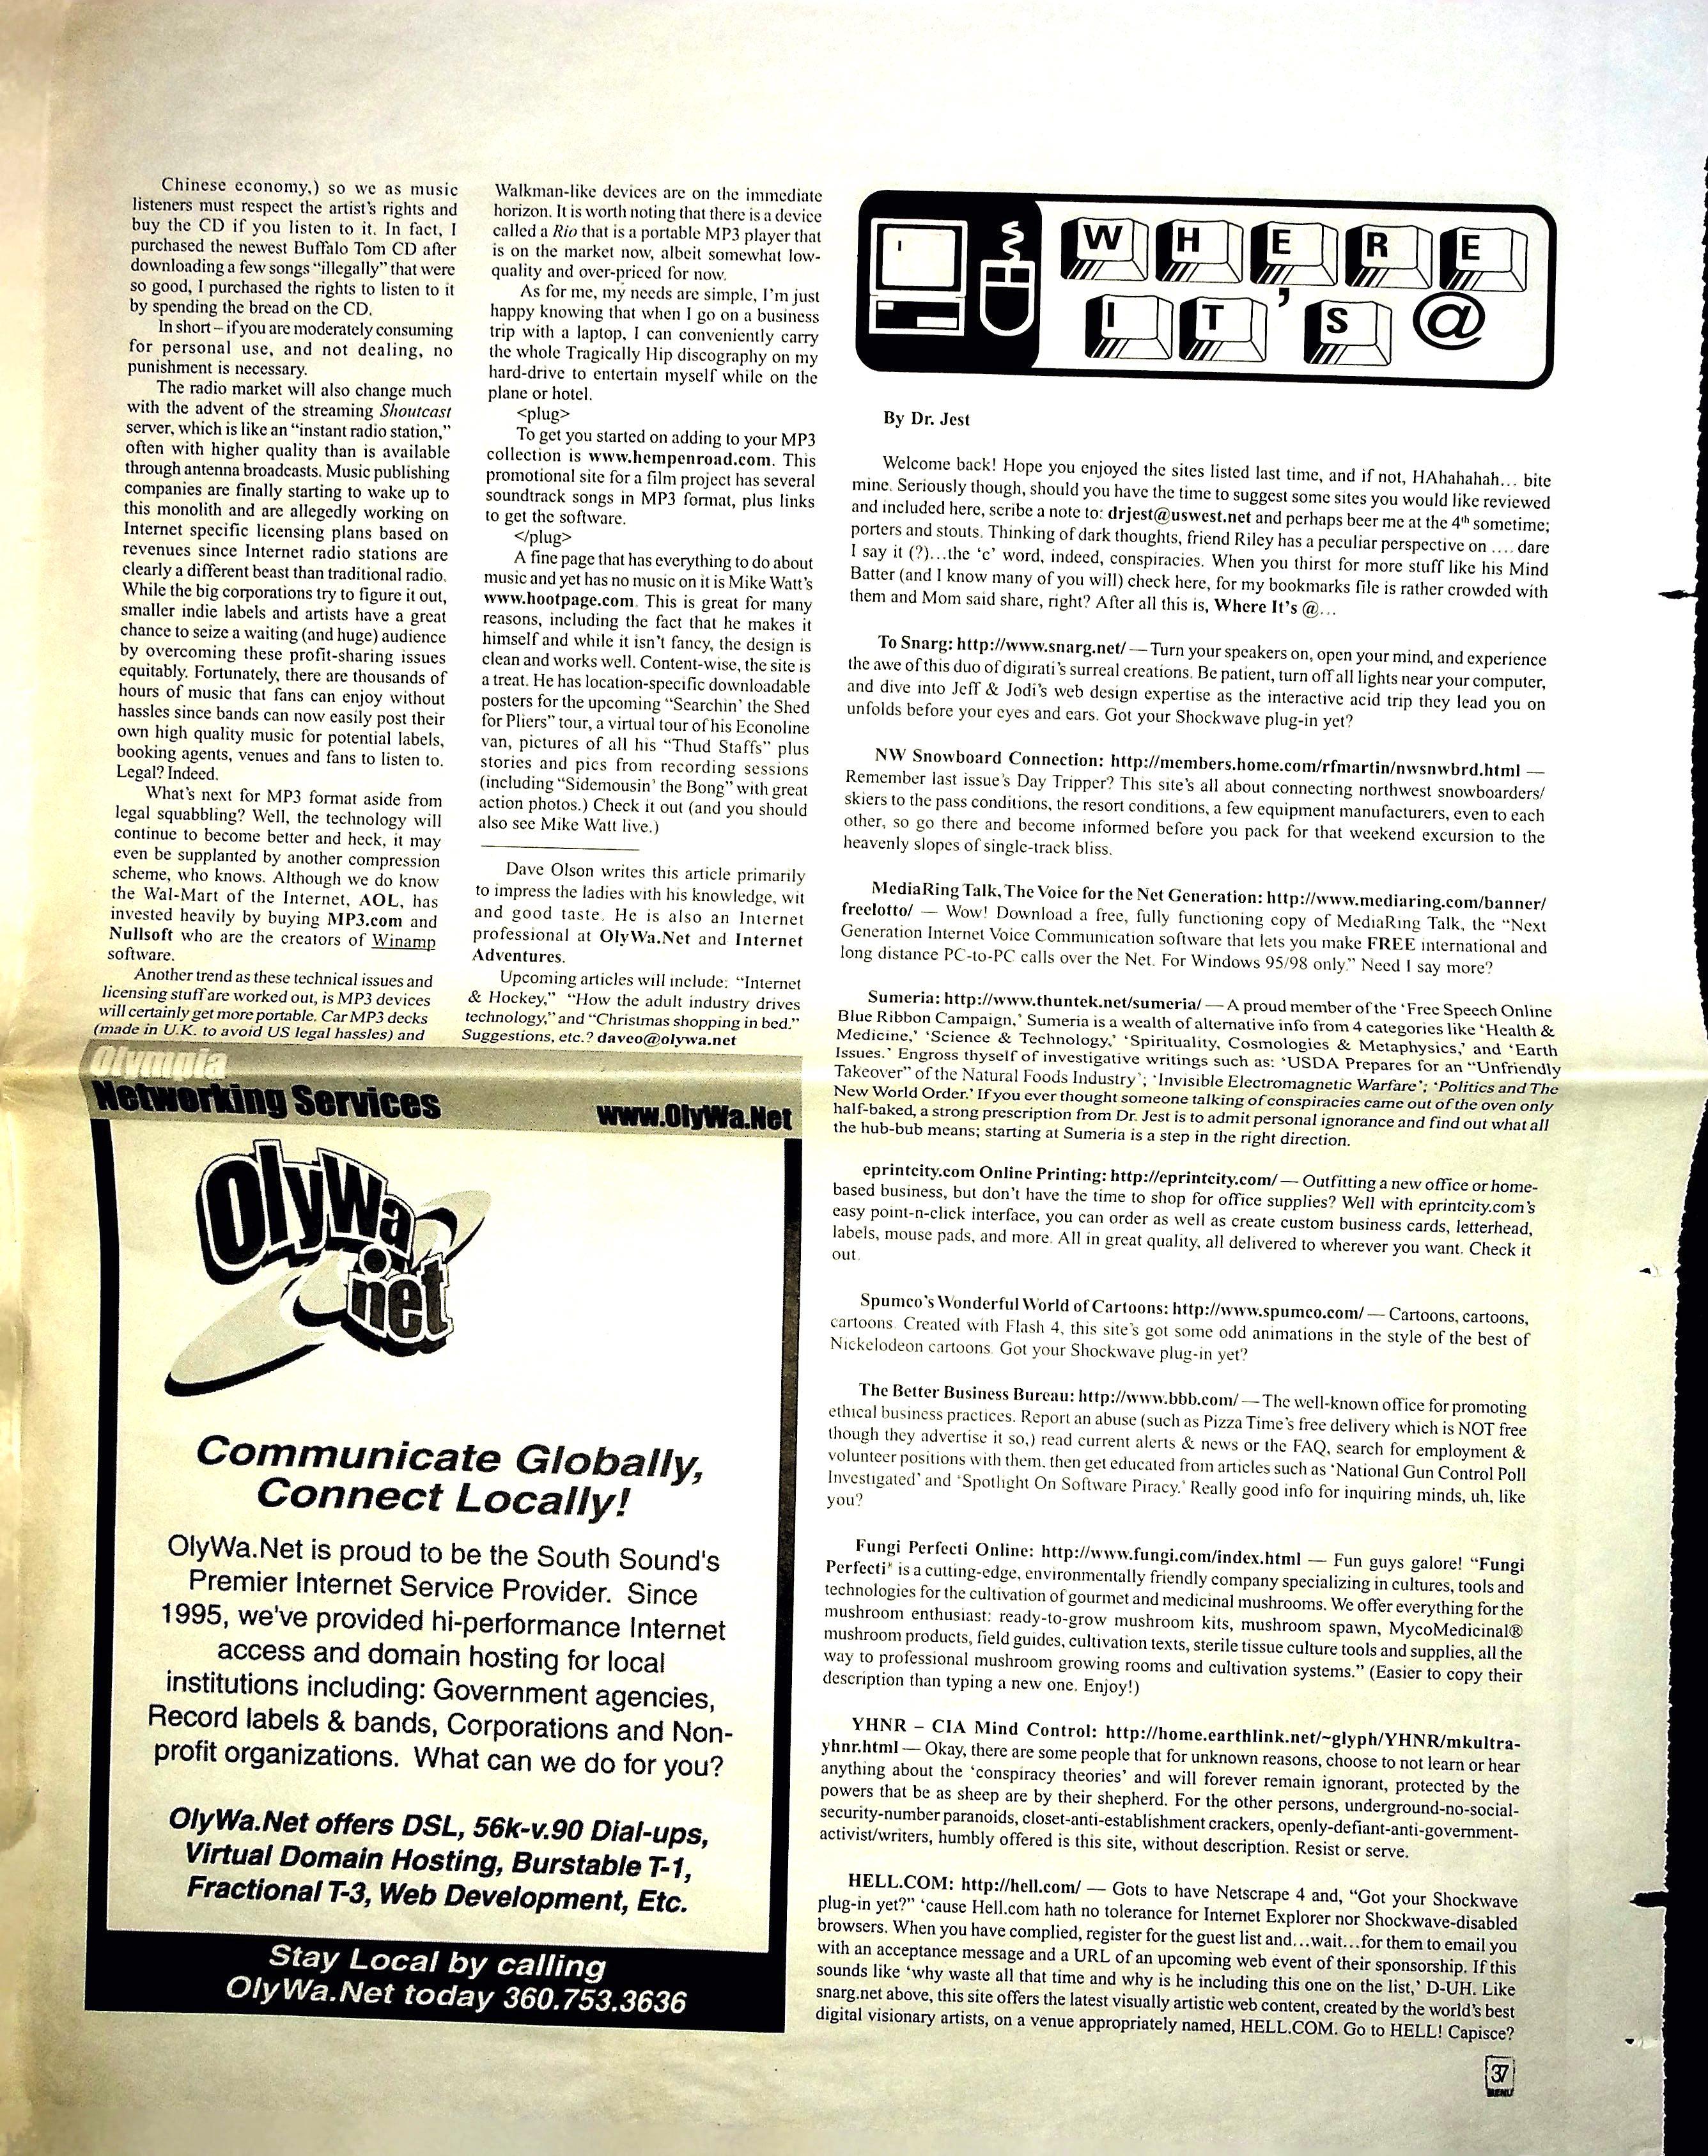 Pub Mp3 Lowdown Menu Magazine Olympia Nov 1999 Dave Olson Creative Life Archive